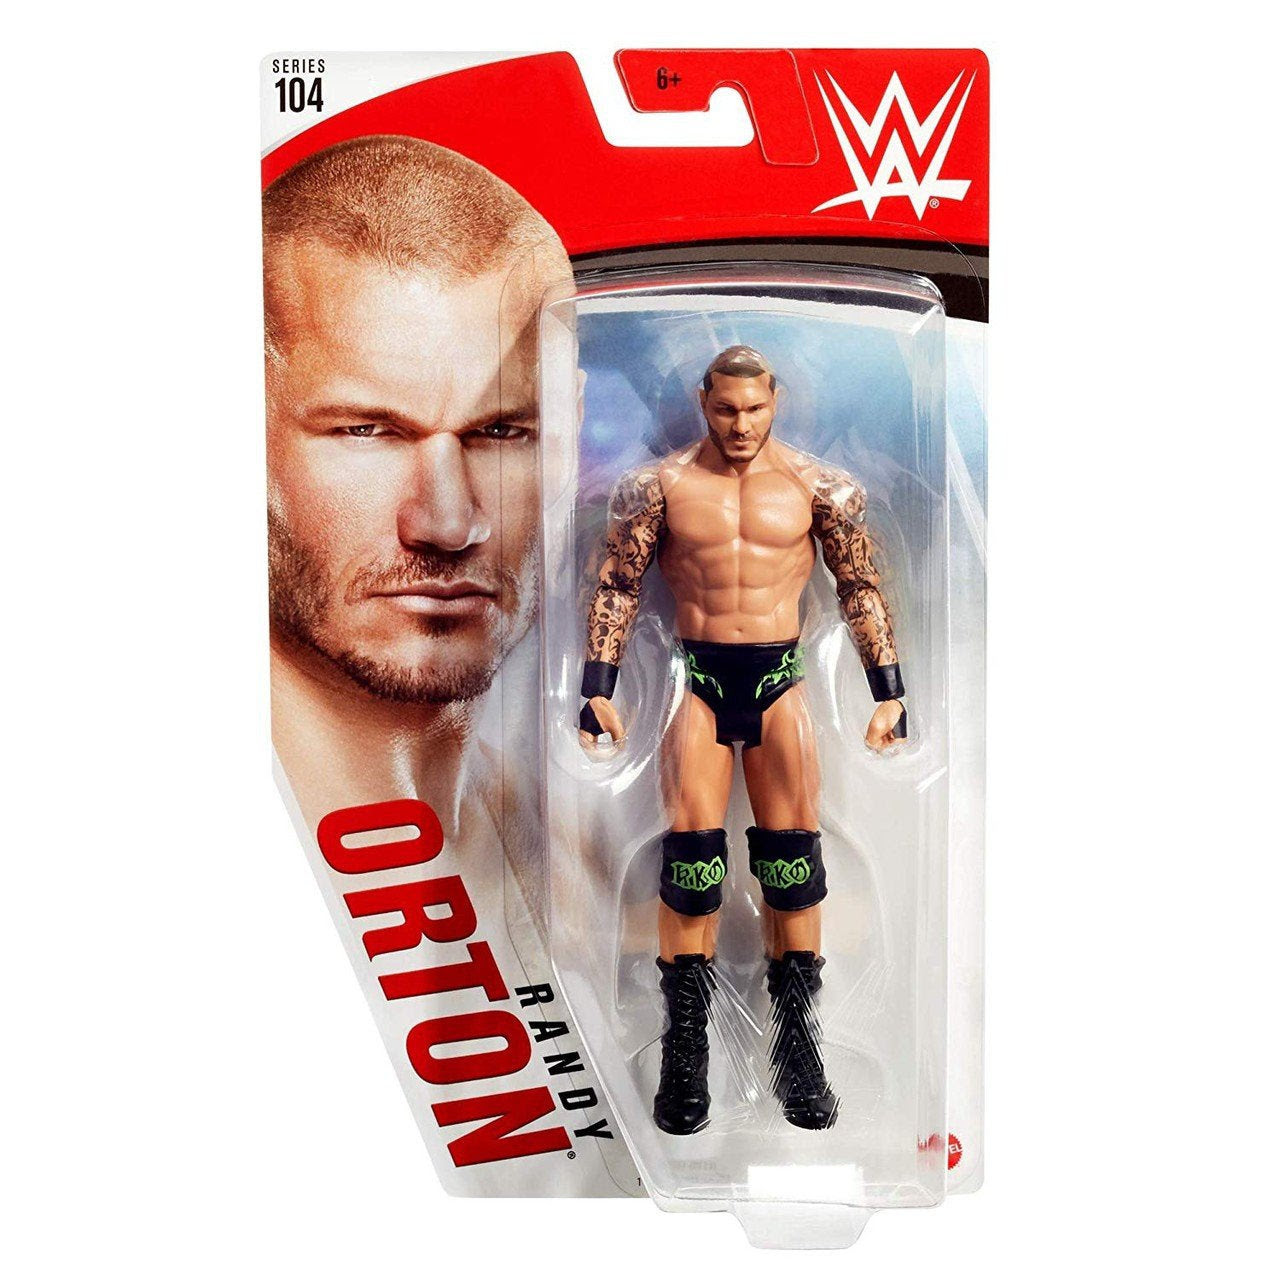 Image of WWE Basic Figure Series 104 - Randy Orton